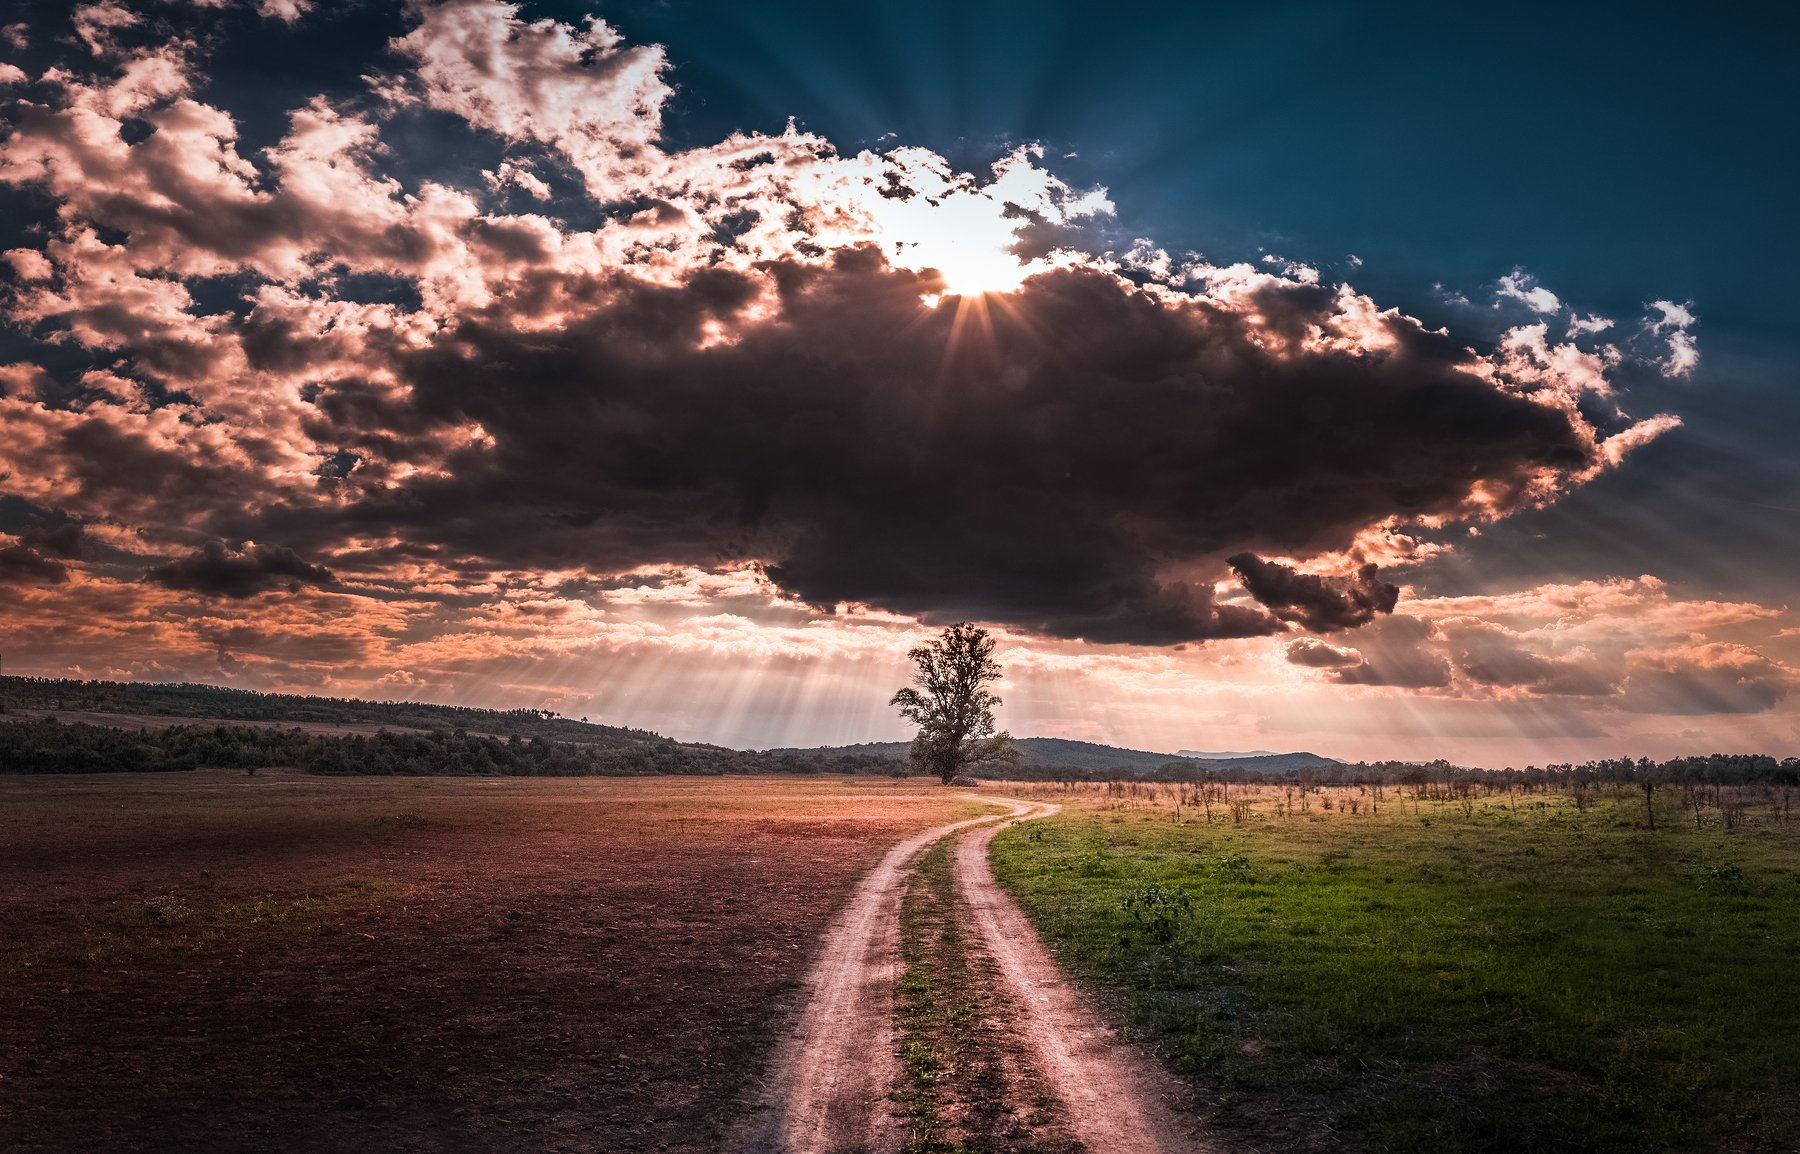 landscape, autumn, summer, road, field, clouds, sky, rays, sunrays, bulgaria, nature, tree, Кристиян Младенов